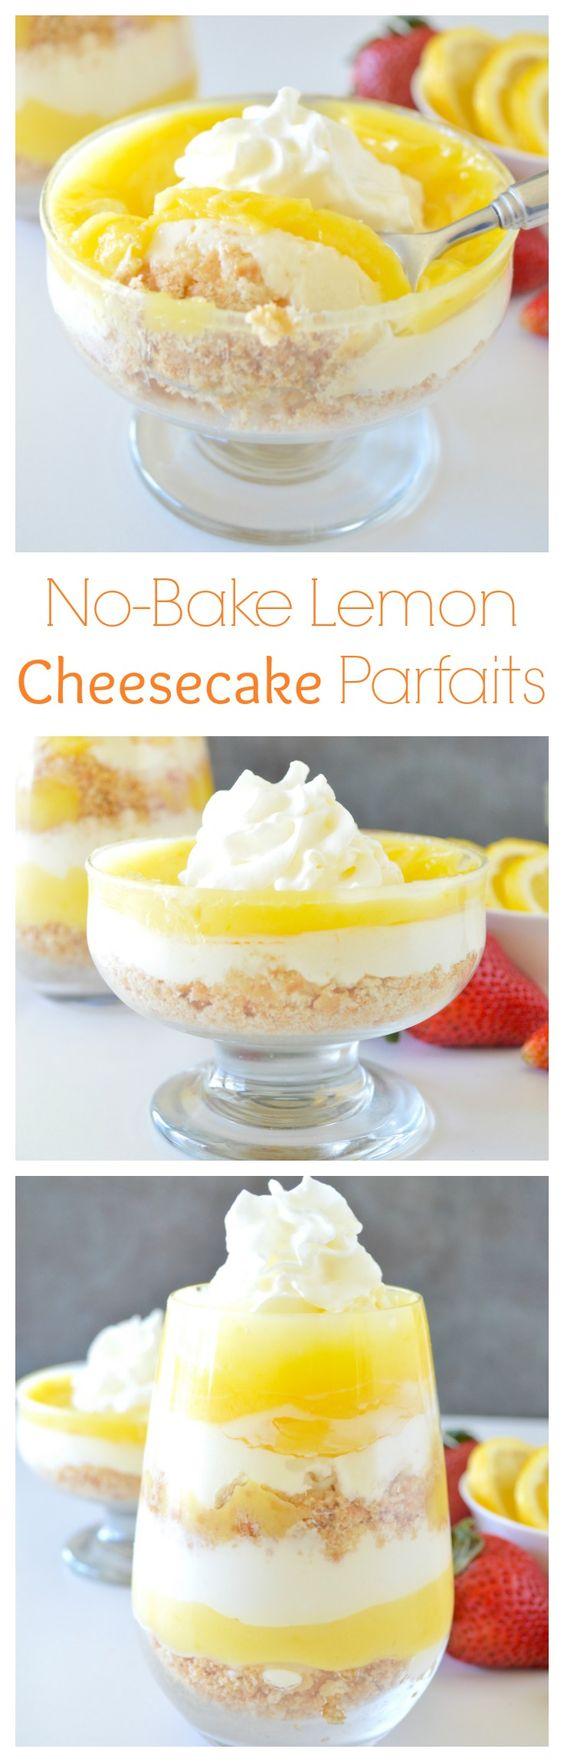 graham cracker crust lemon cheesecake graham crackers no bake lemon ...